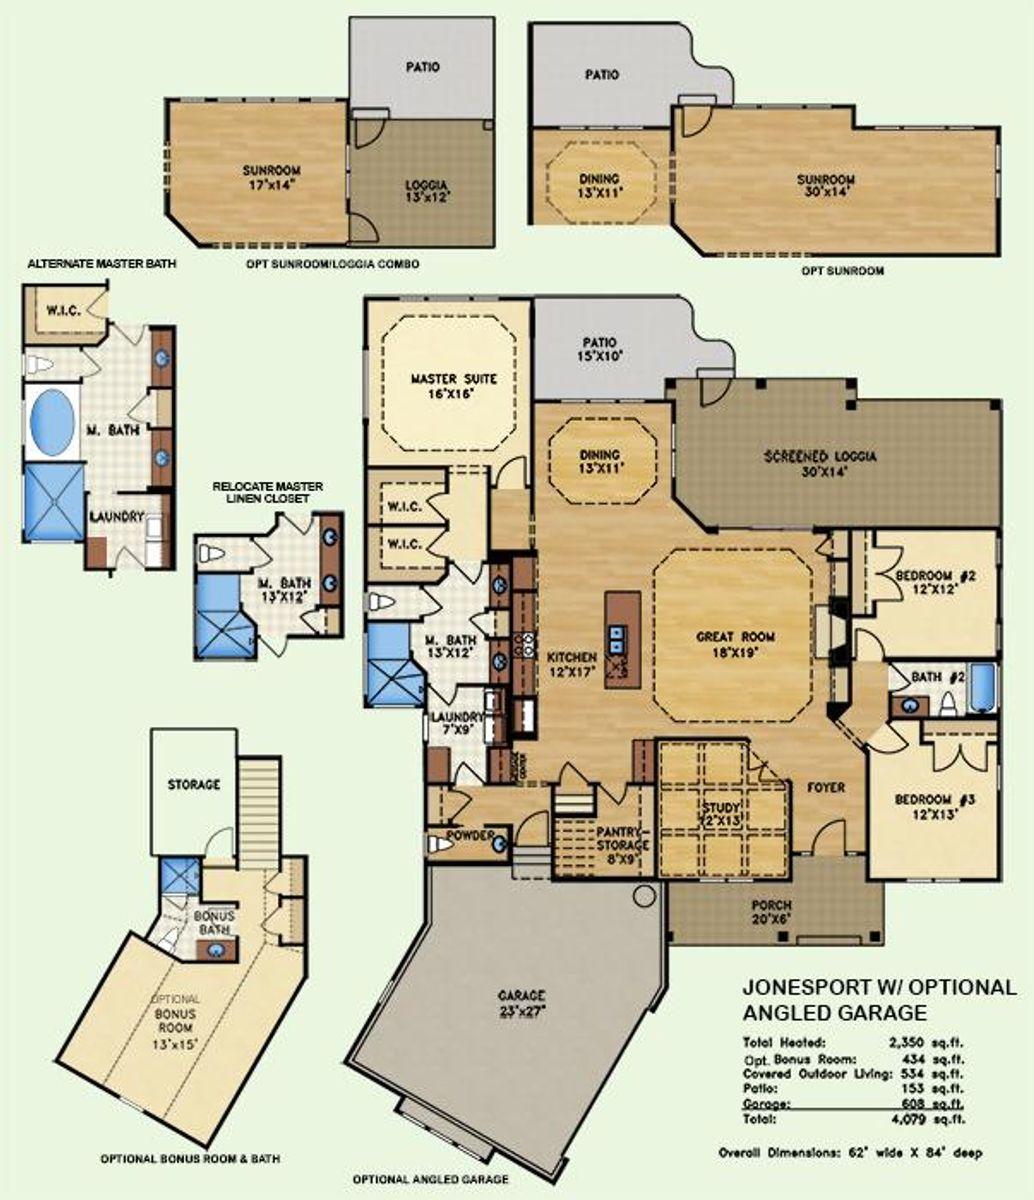 Jonesport, Floor Plan w/ Optional Angled Garage